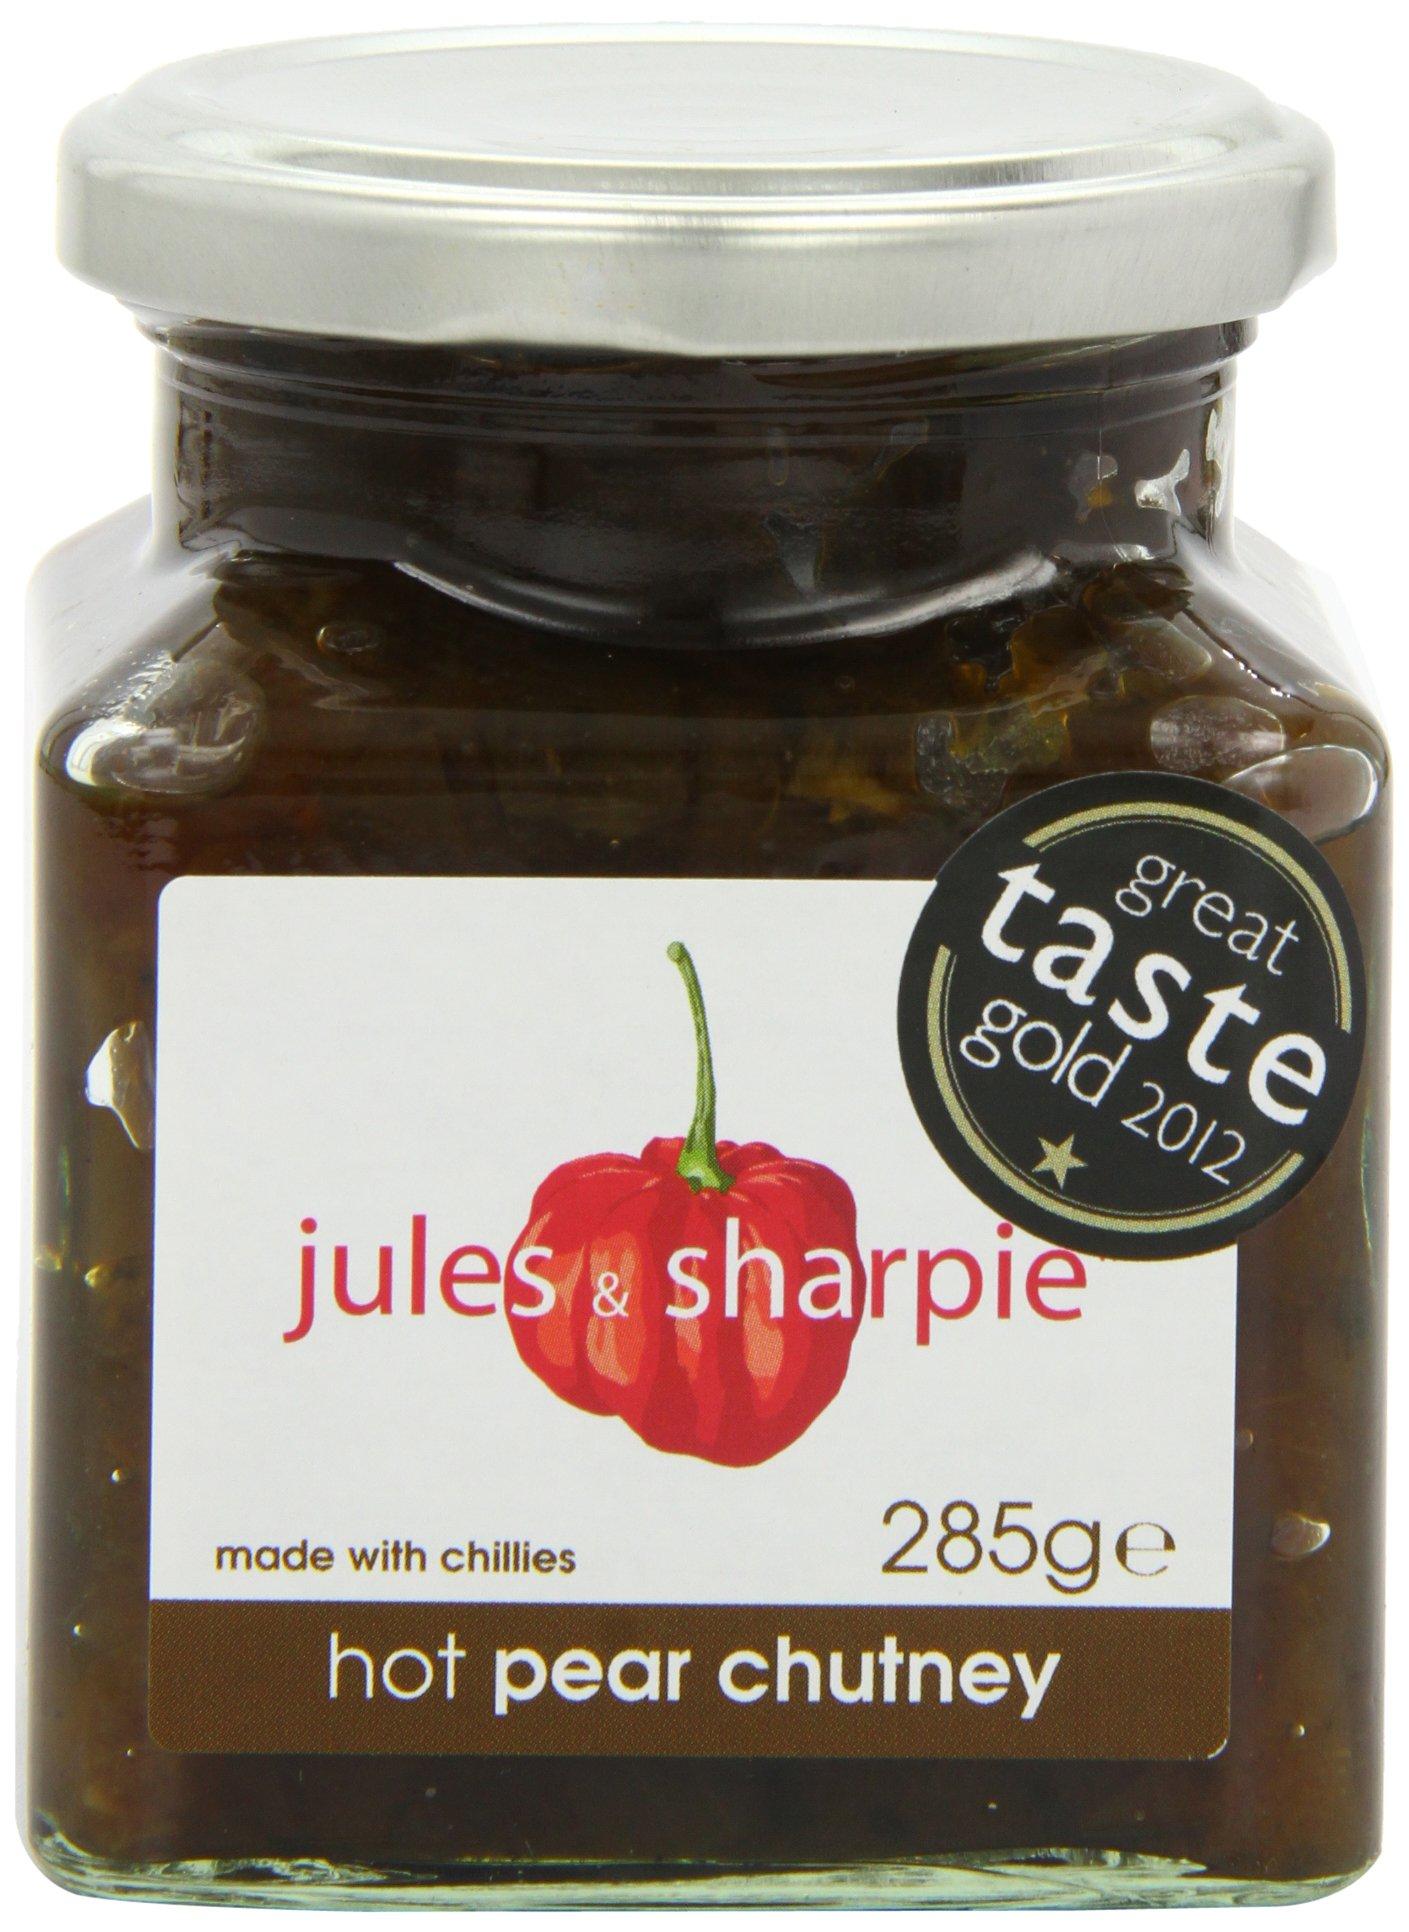 Jules & Sharpie Hot Pear Chutney (285g) by Jules & Sharpie